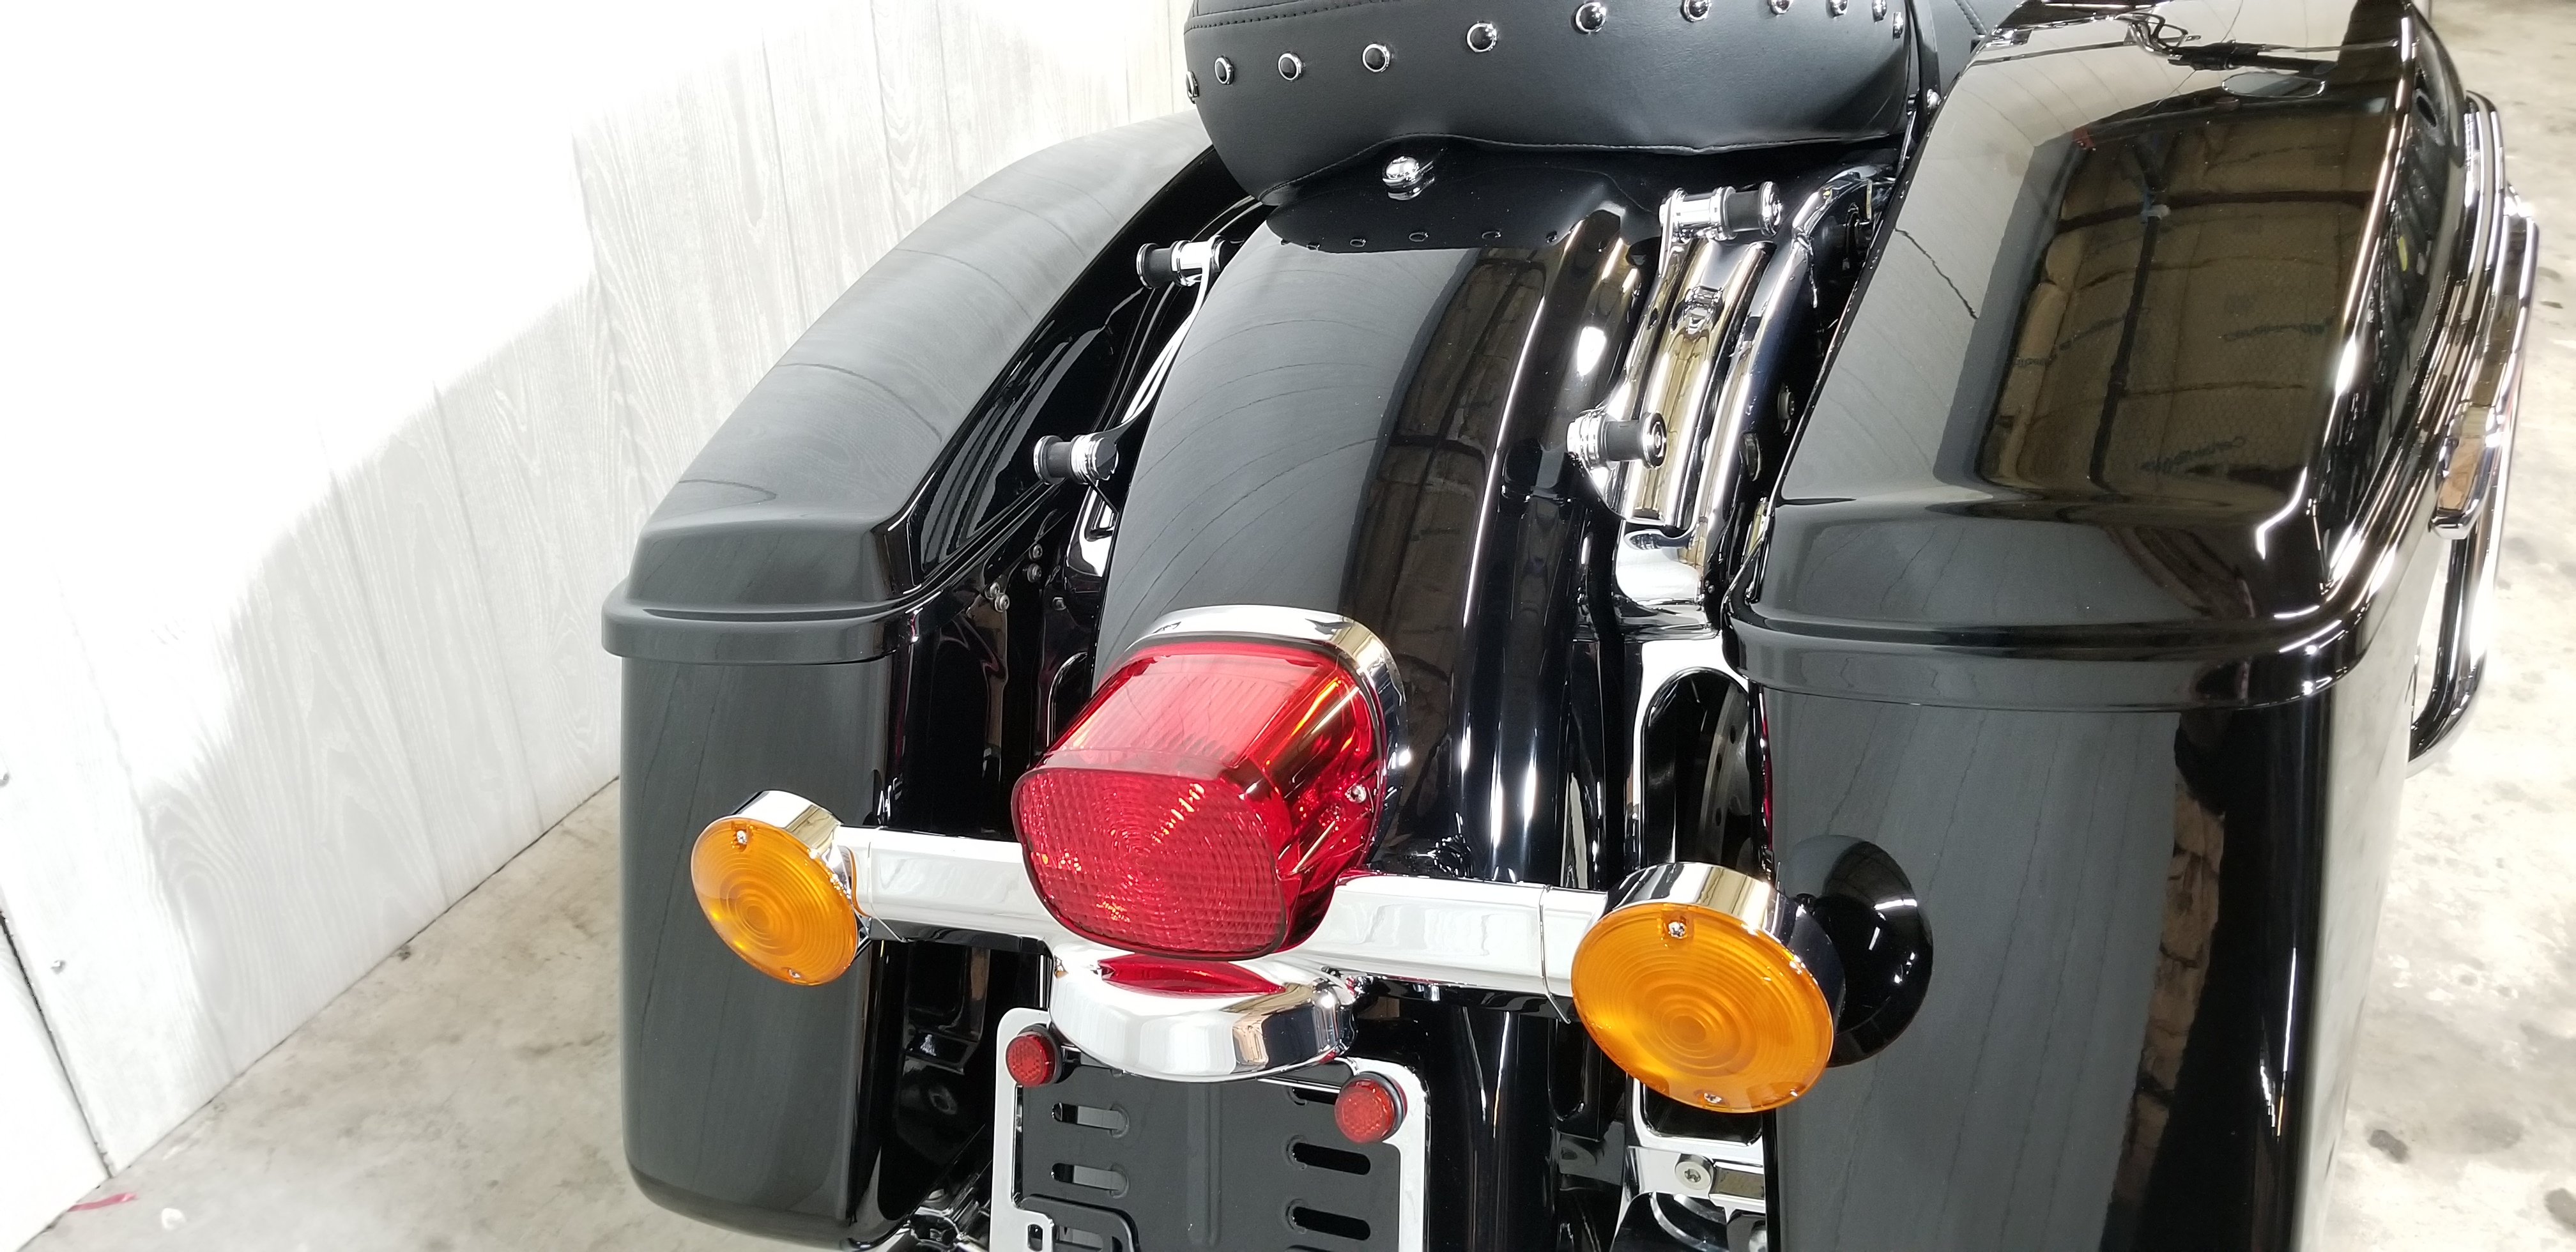 New 2020 Harley-Davidson Road King FLHR